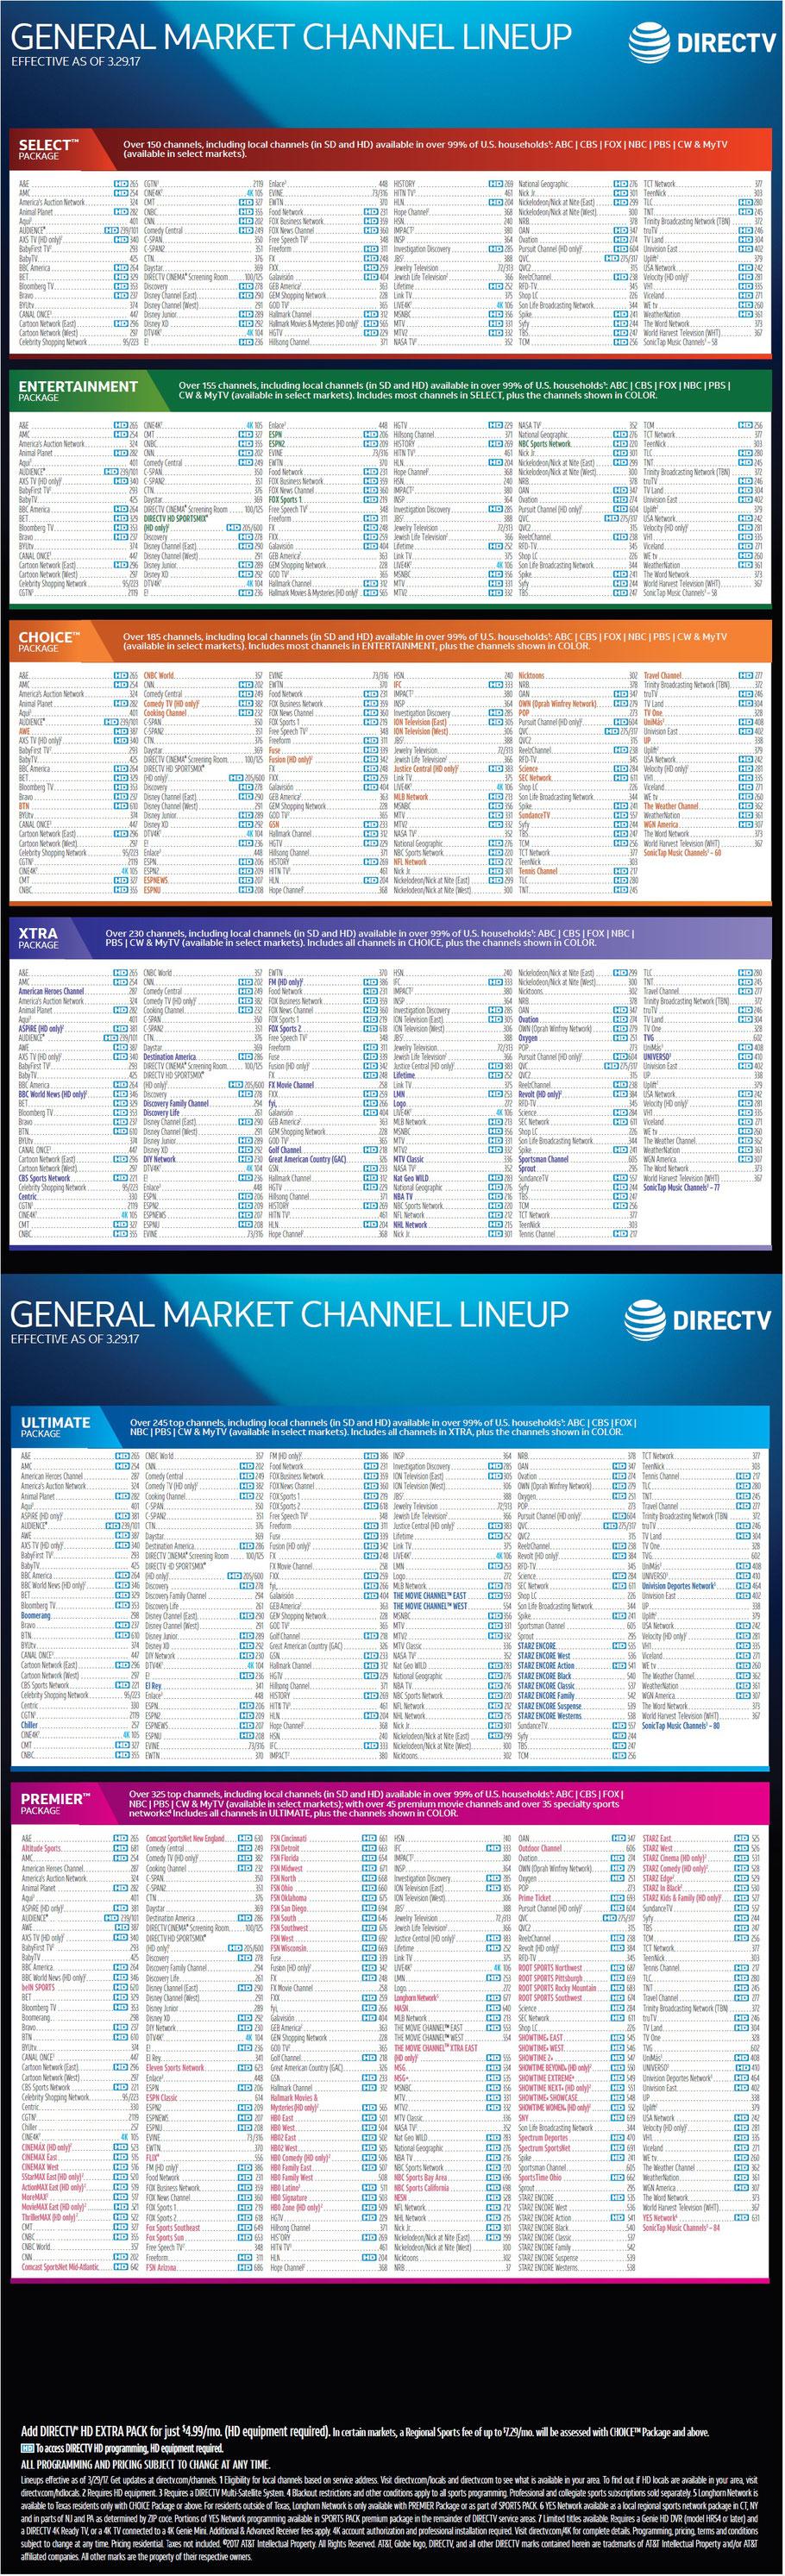 Impeccable image regarding printable directv channel lineup